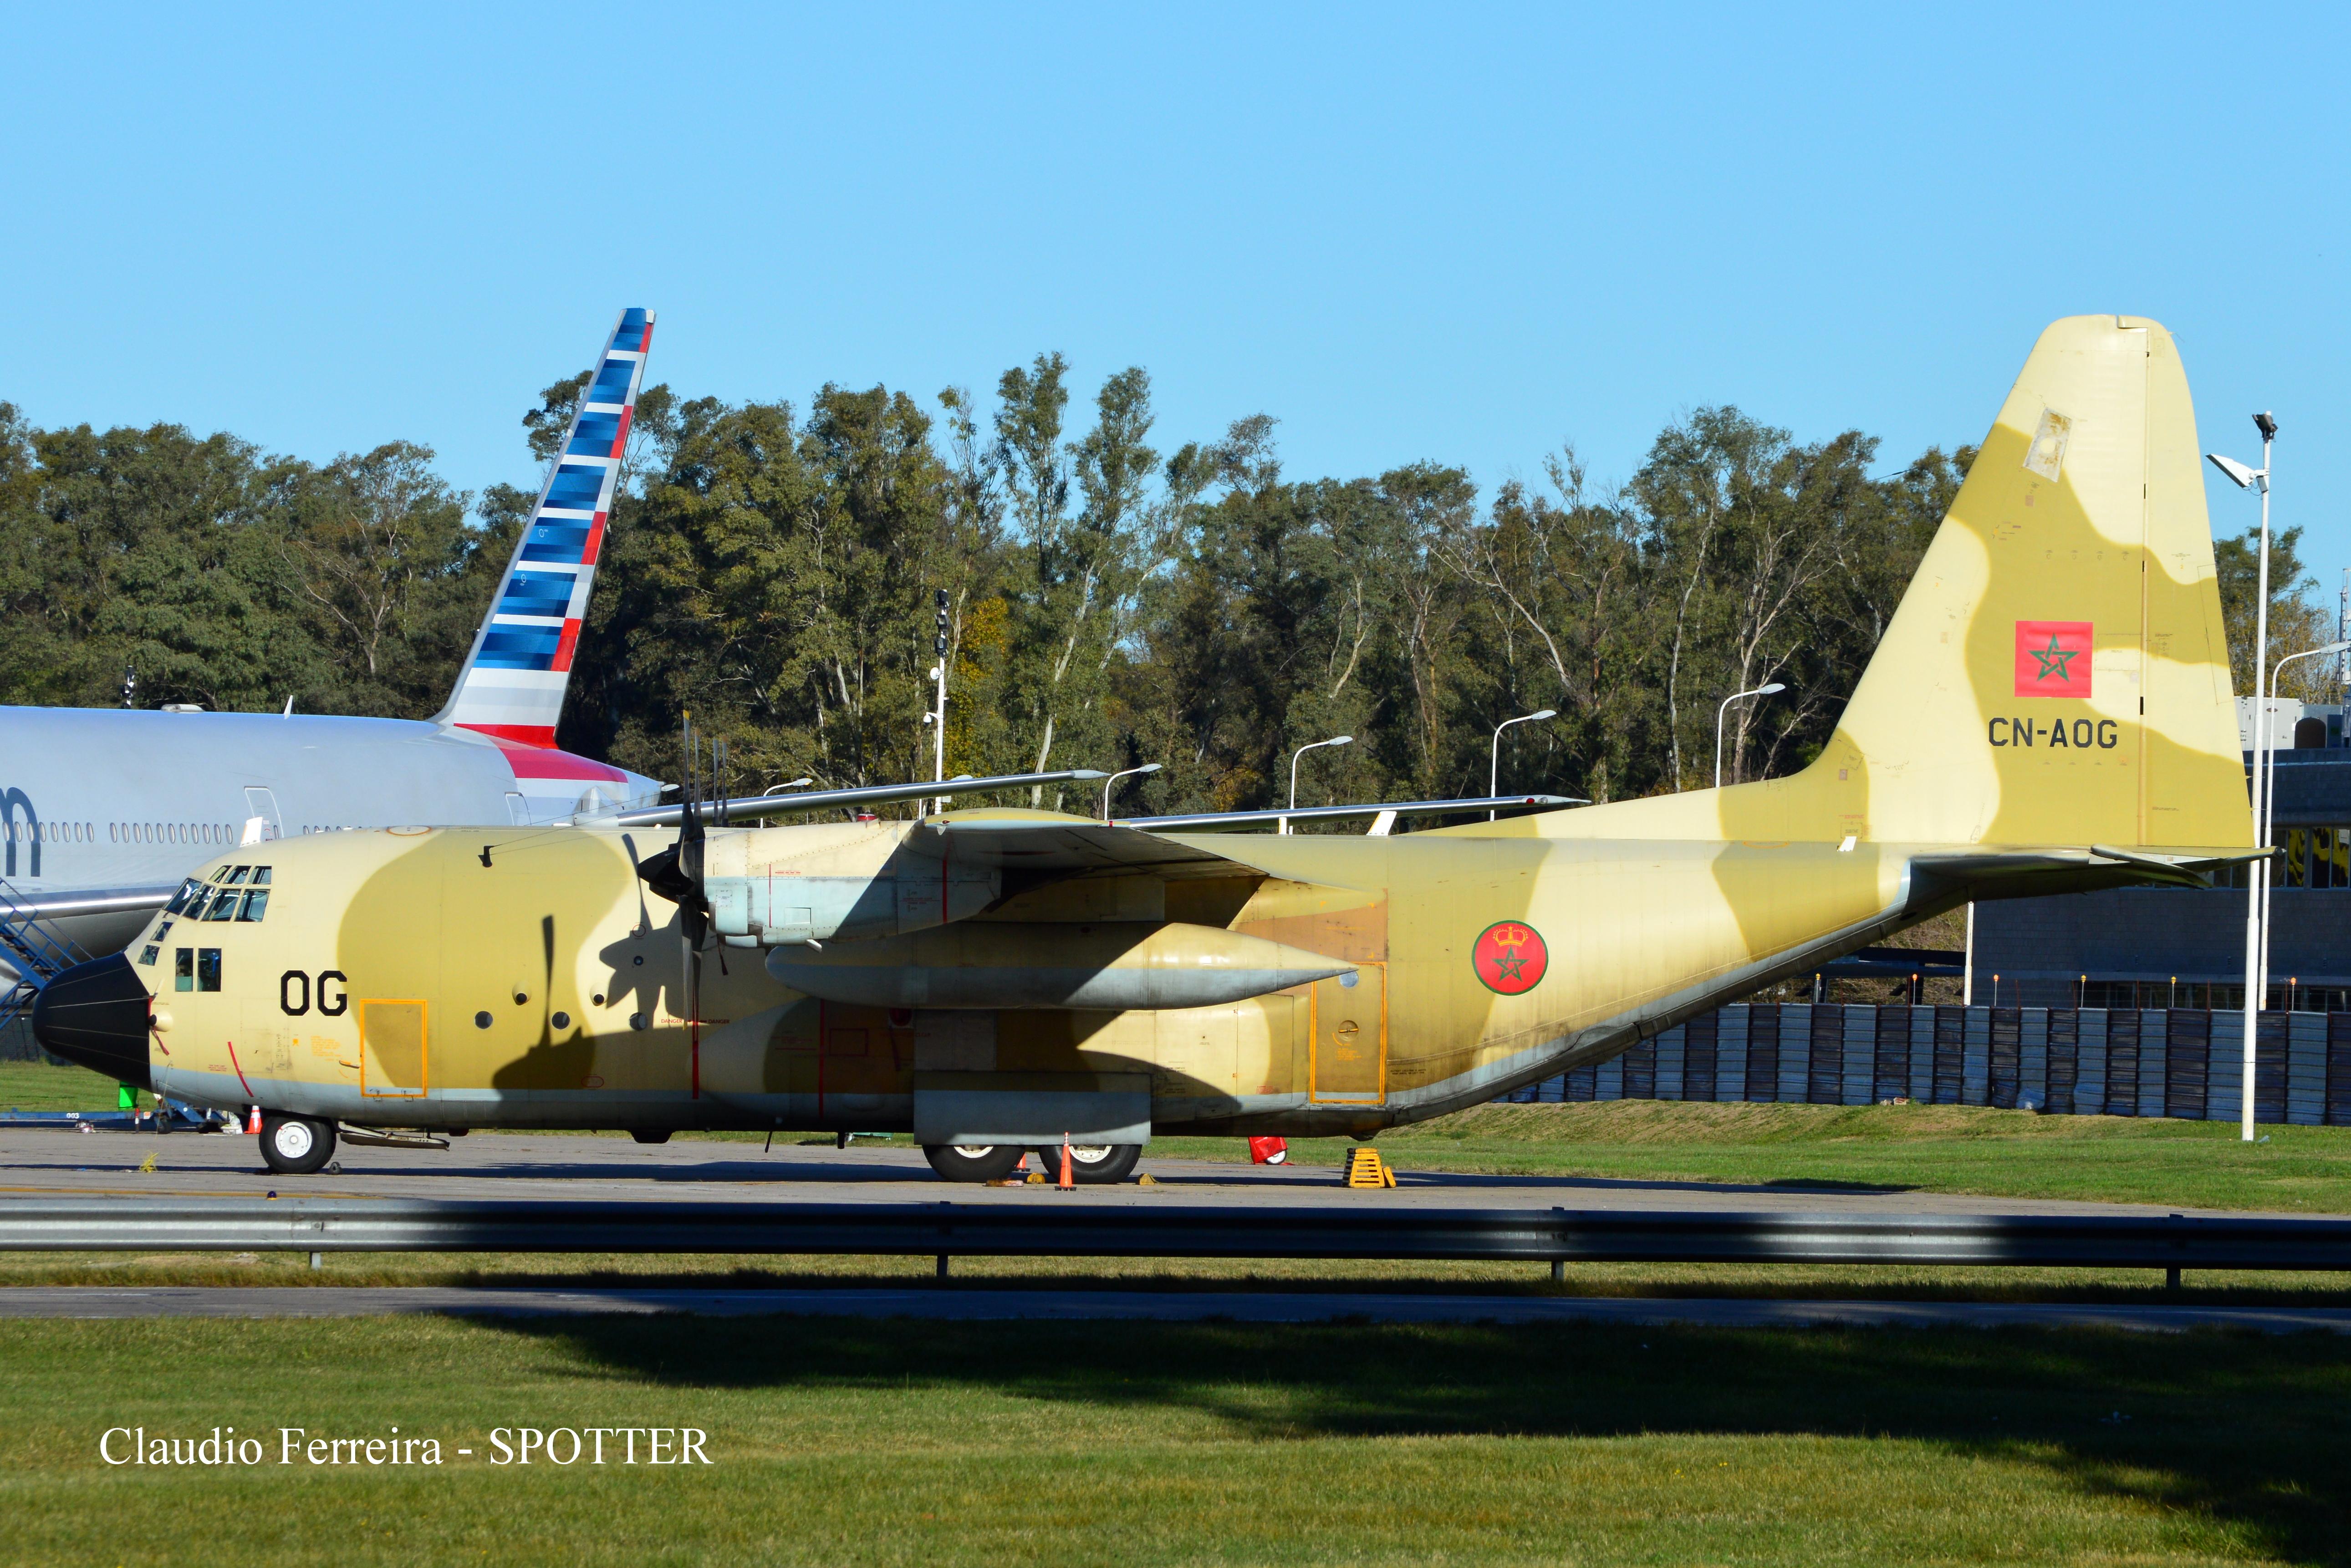 FRA: Photos d'avions de transport - Page 31 34912438305_693b12fd5c_o